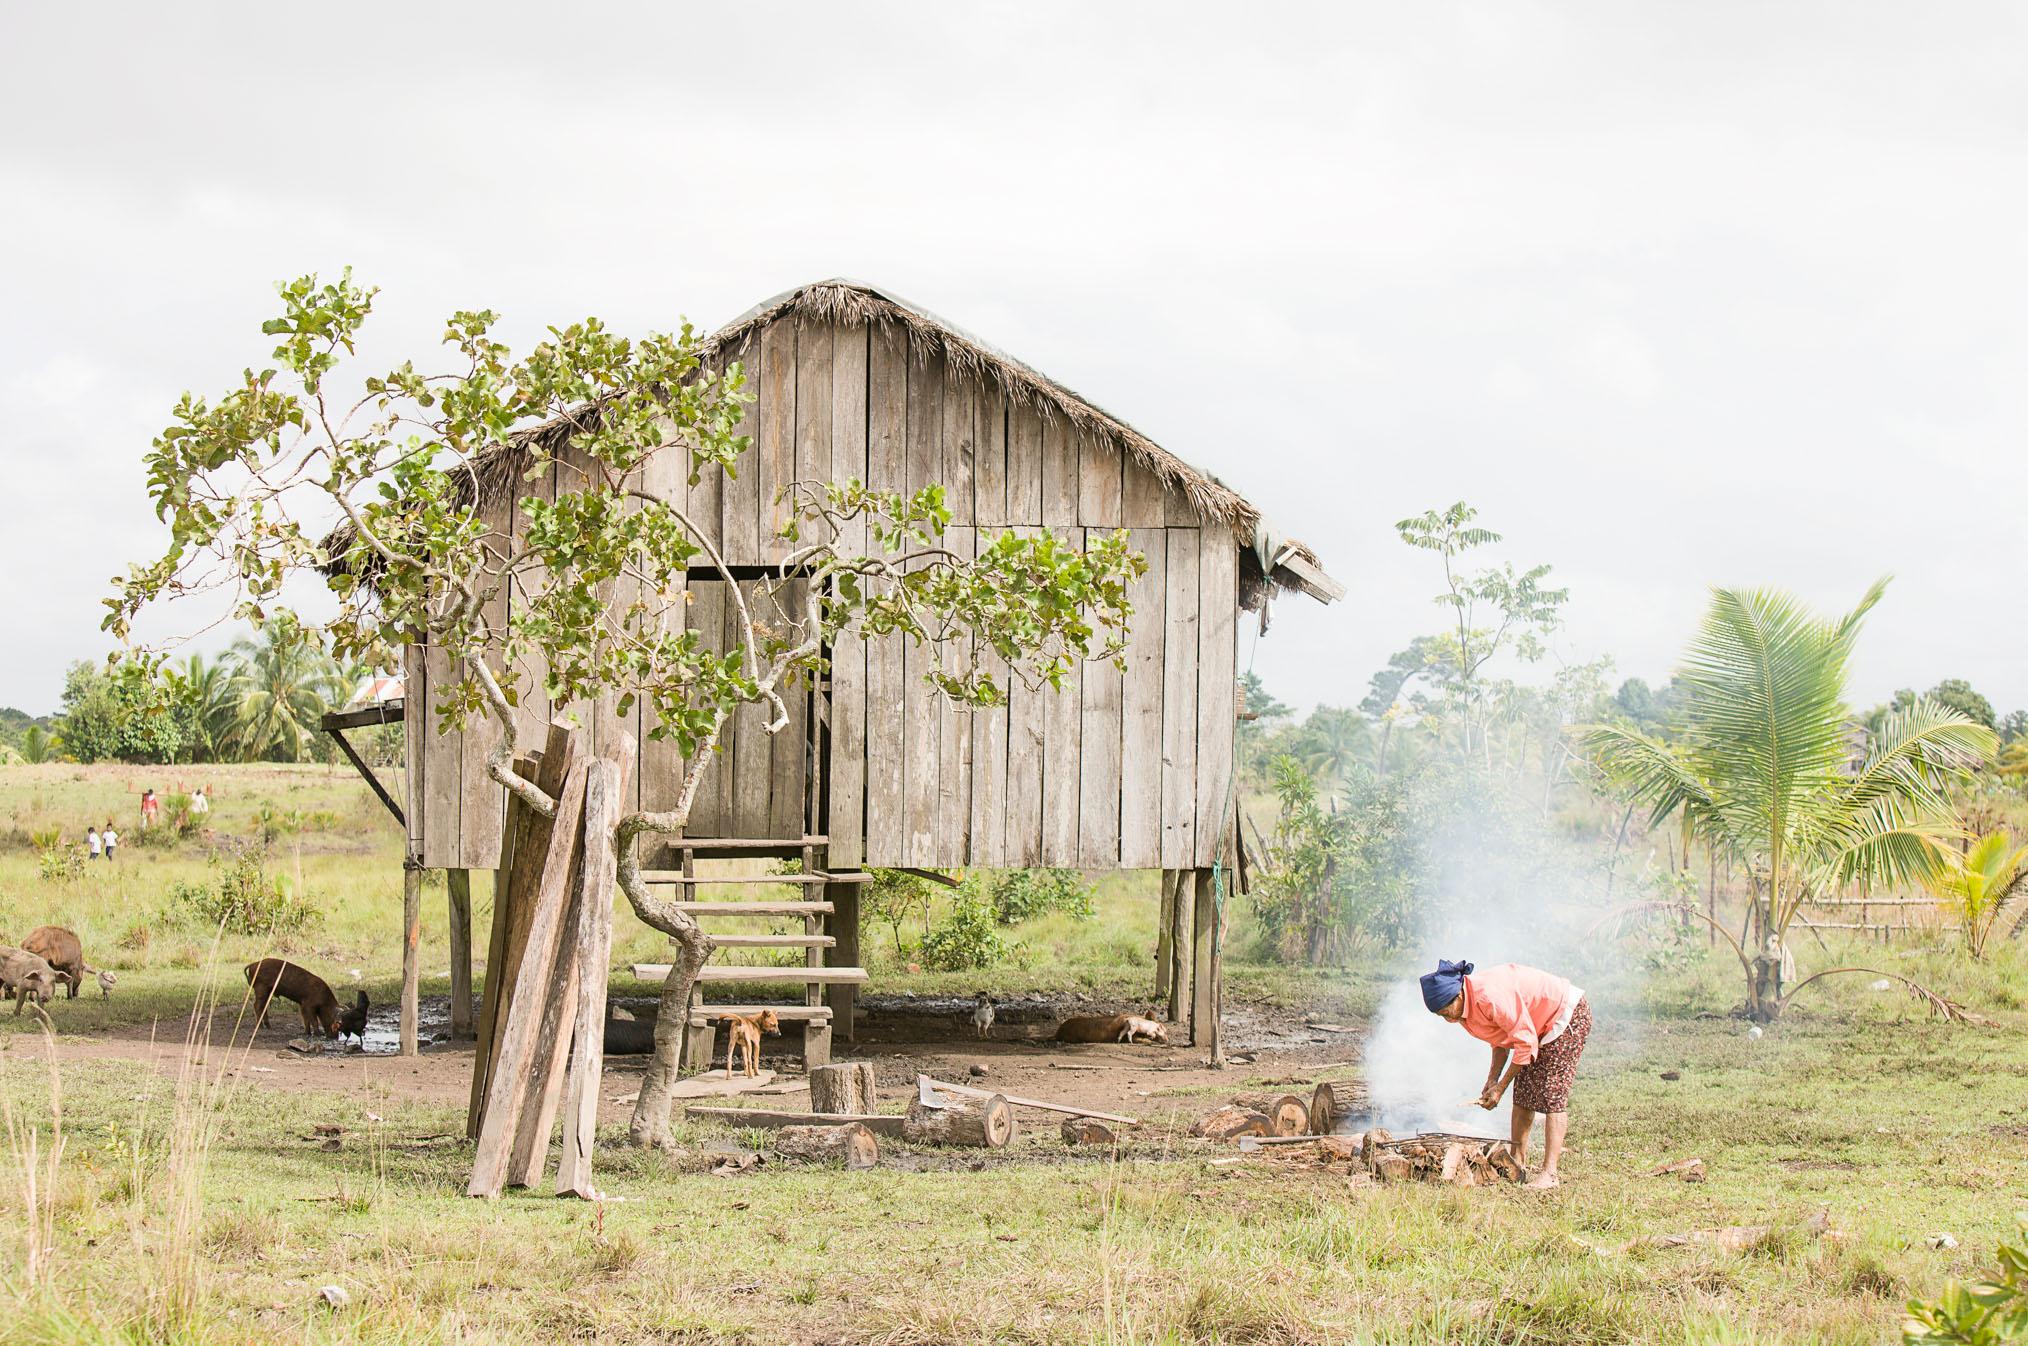 Cooking, La Mosquitia, Rumdin community, Honduras - If Not Us Then Who?